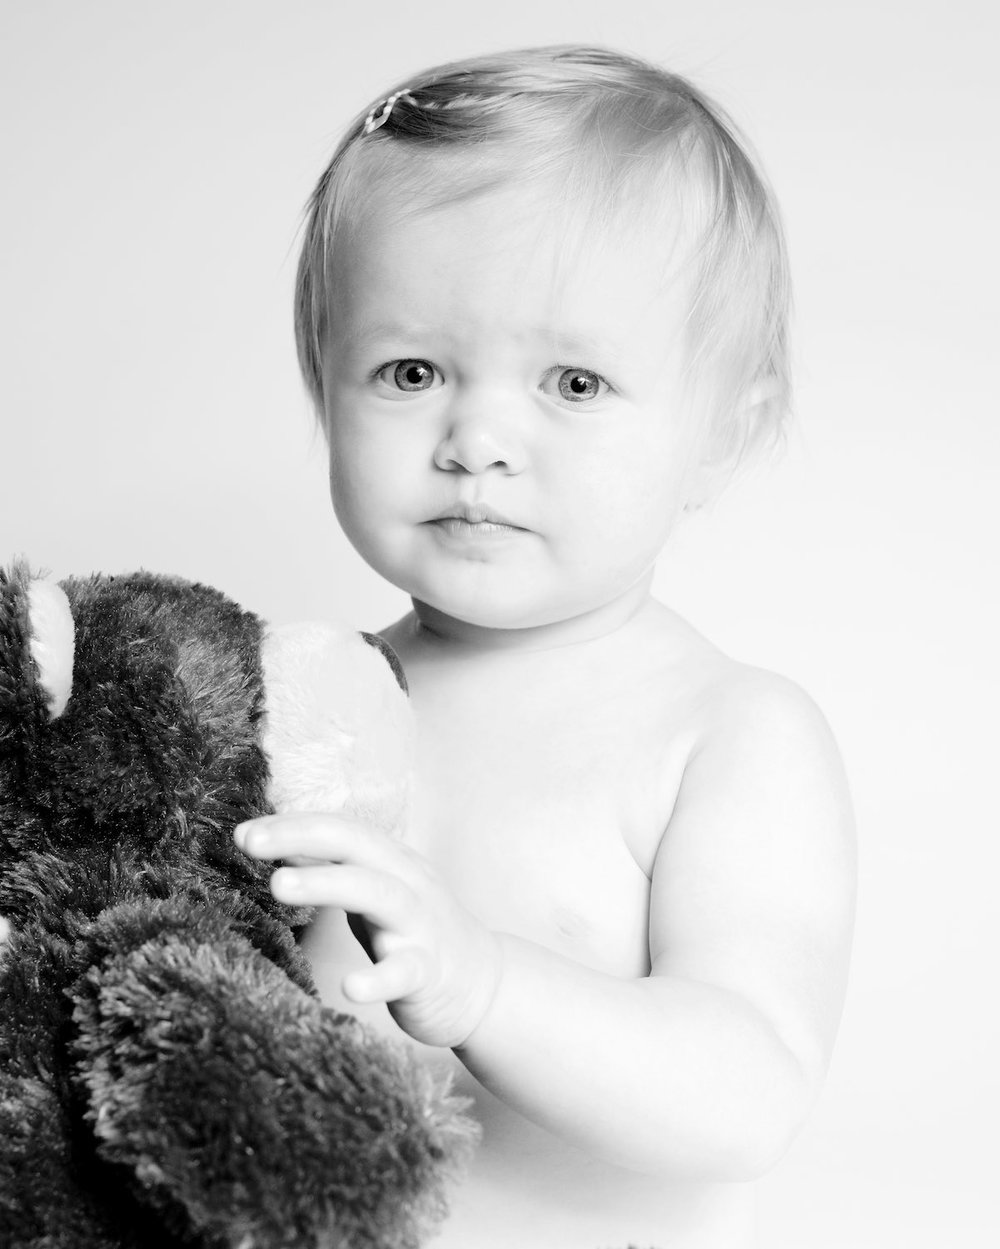 michal-pfeil-baby-portrait-12.jpg